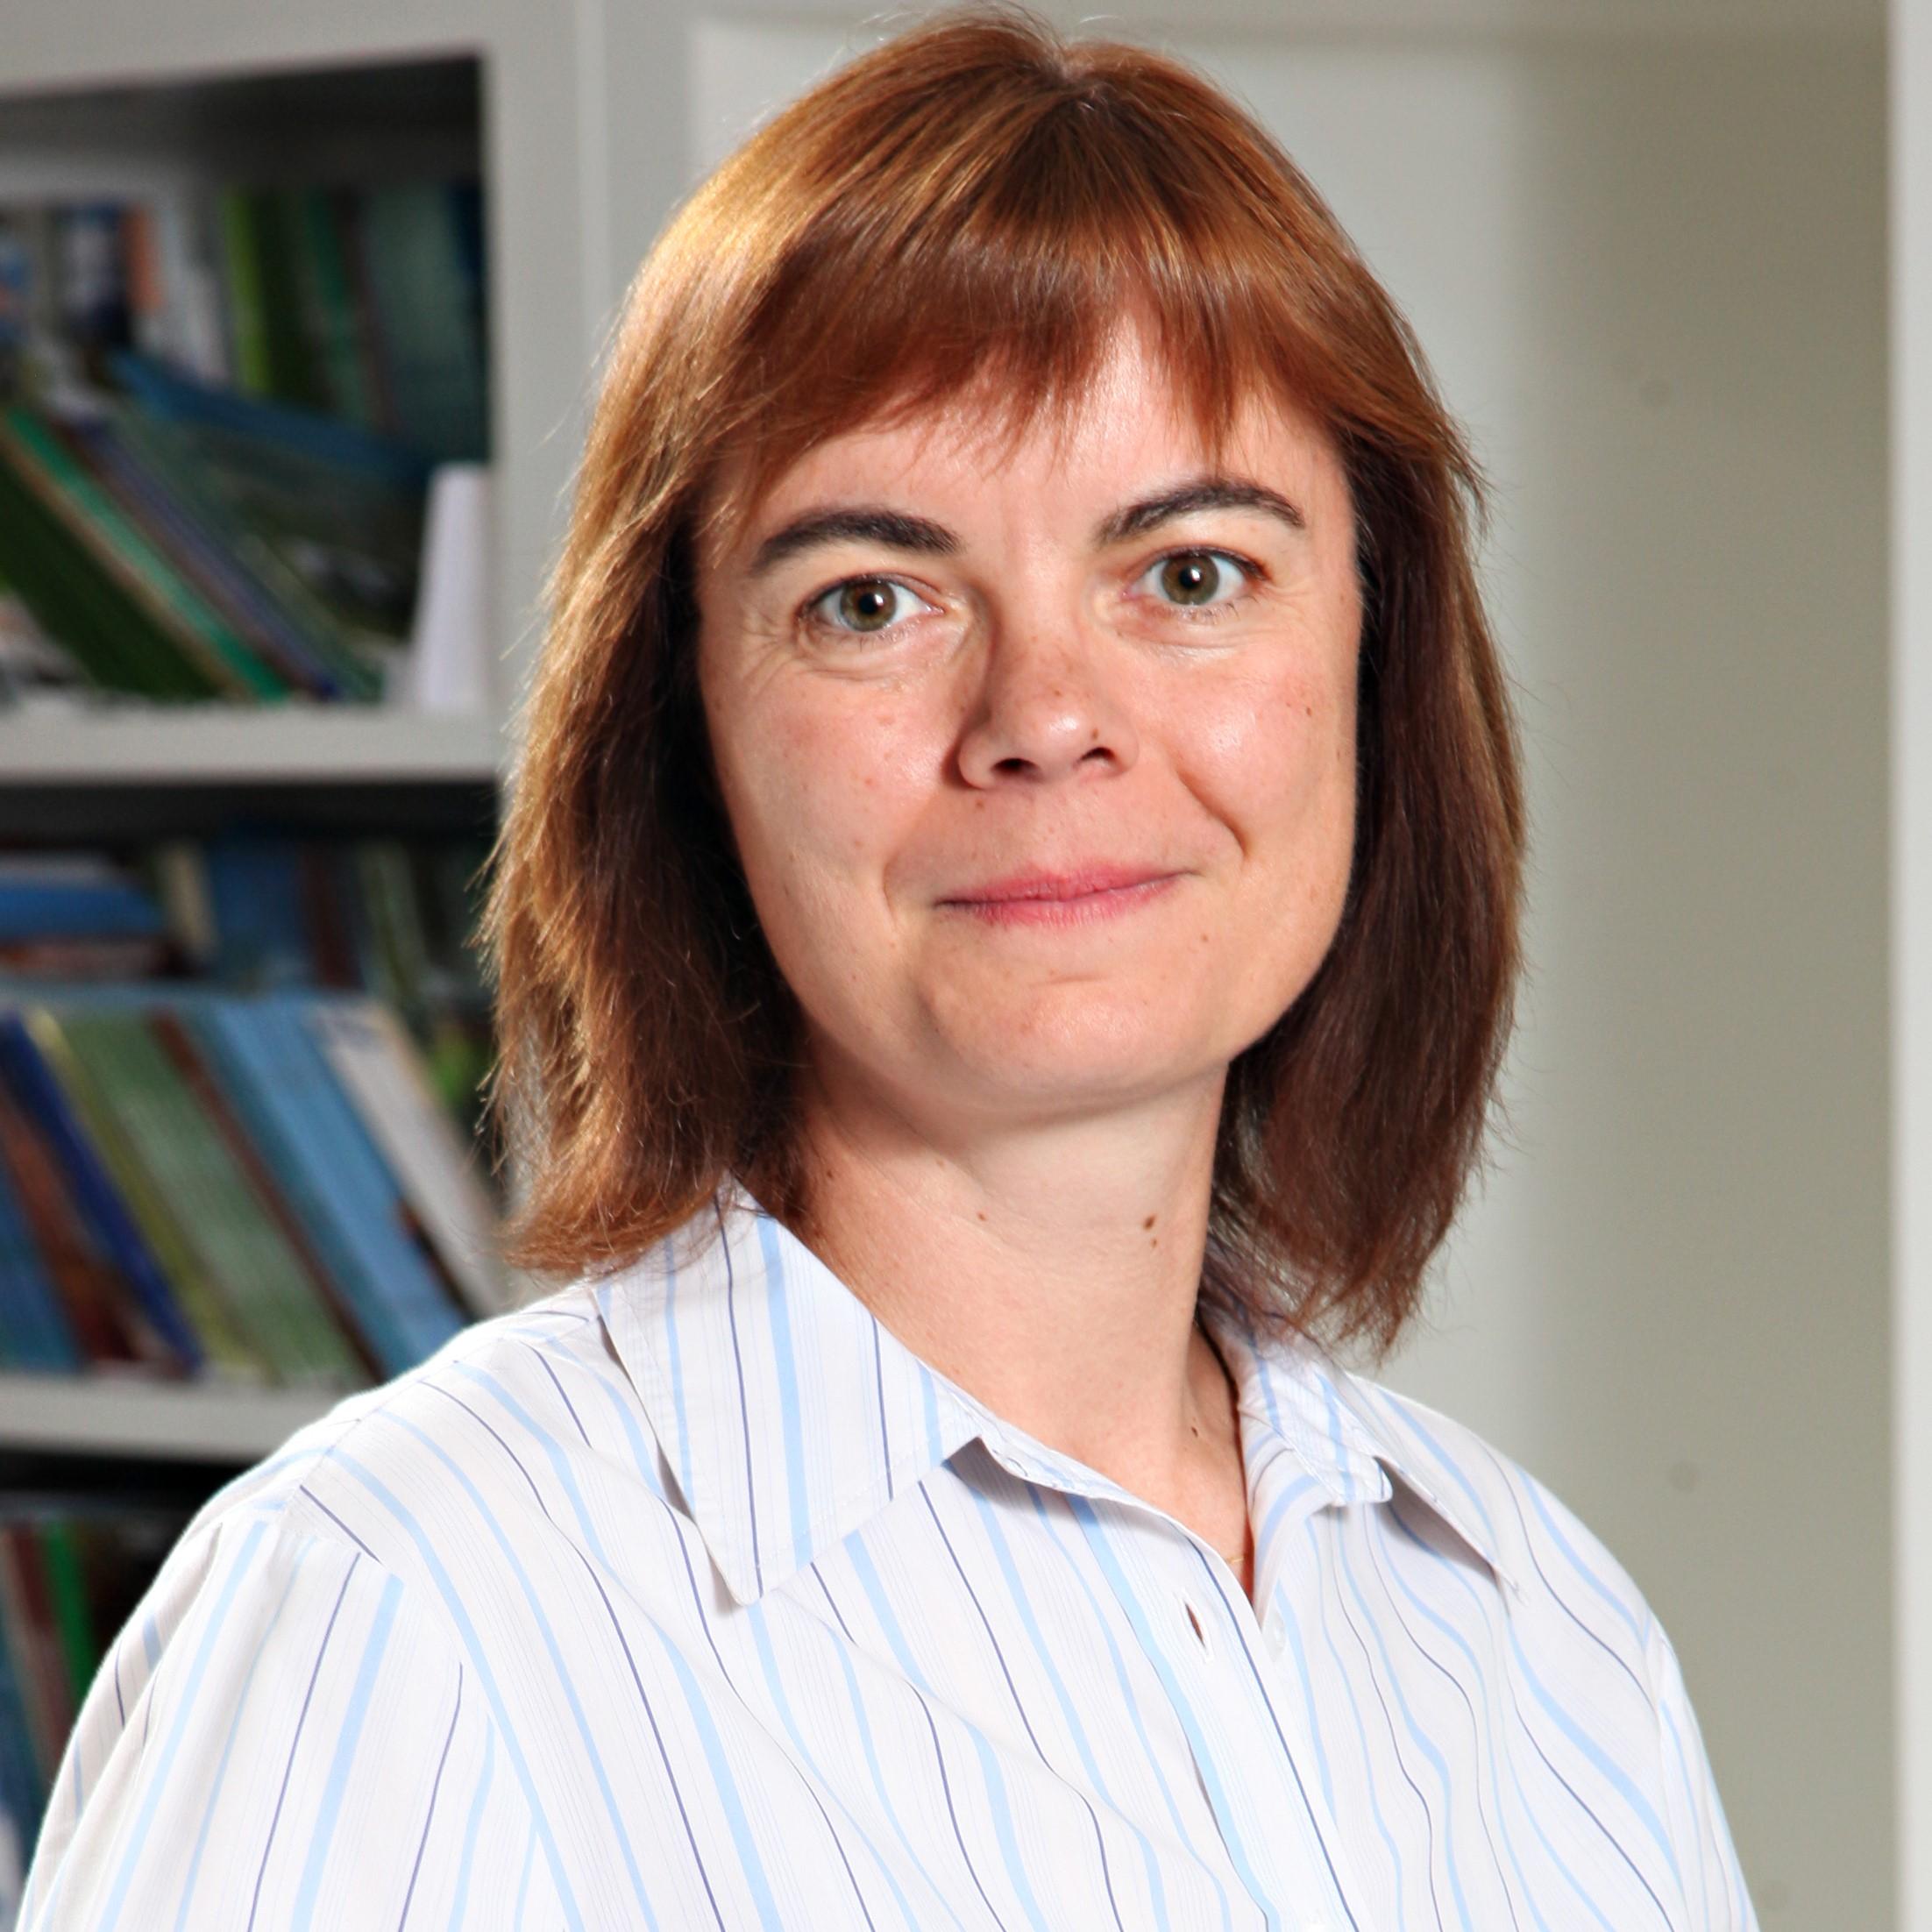 Photograph of Jo Burgess